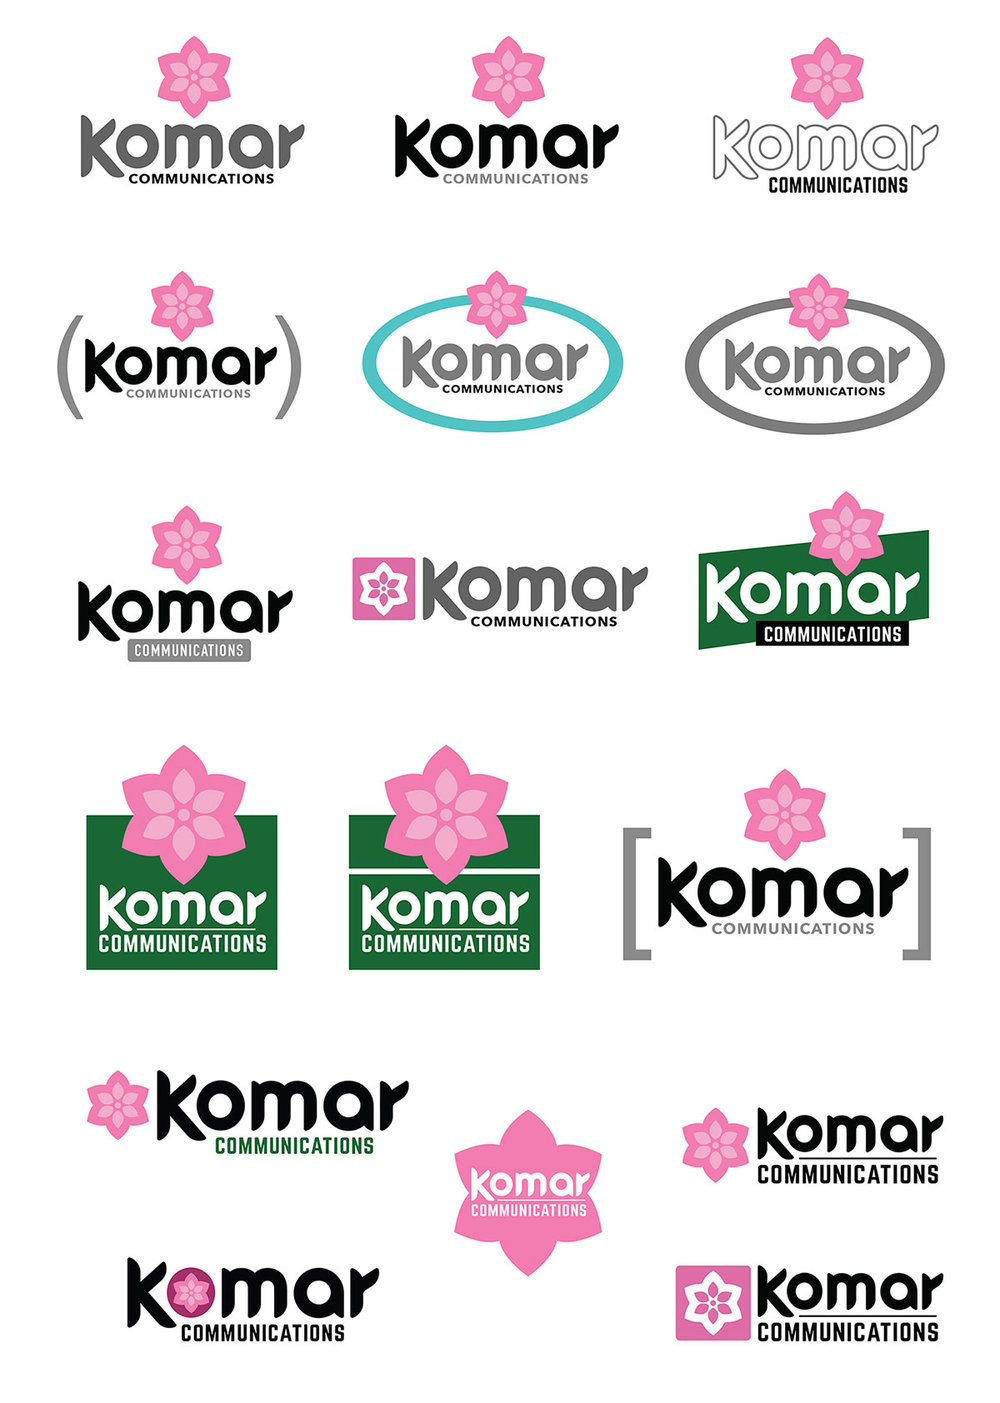 Komar-communications-last-round.jpg